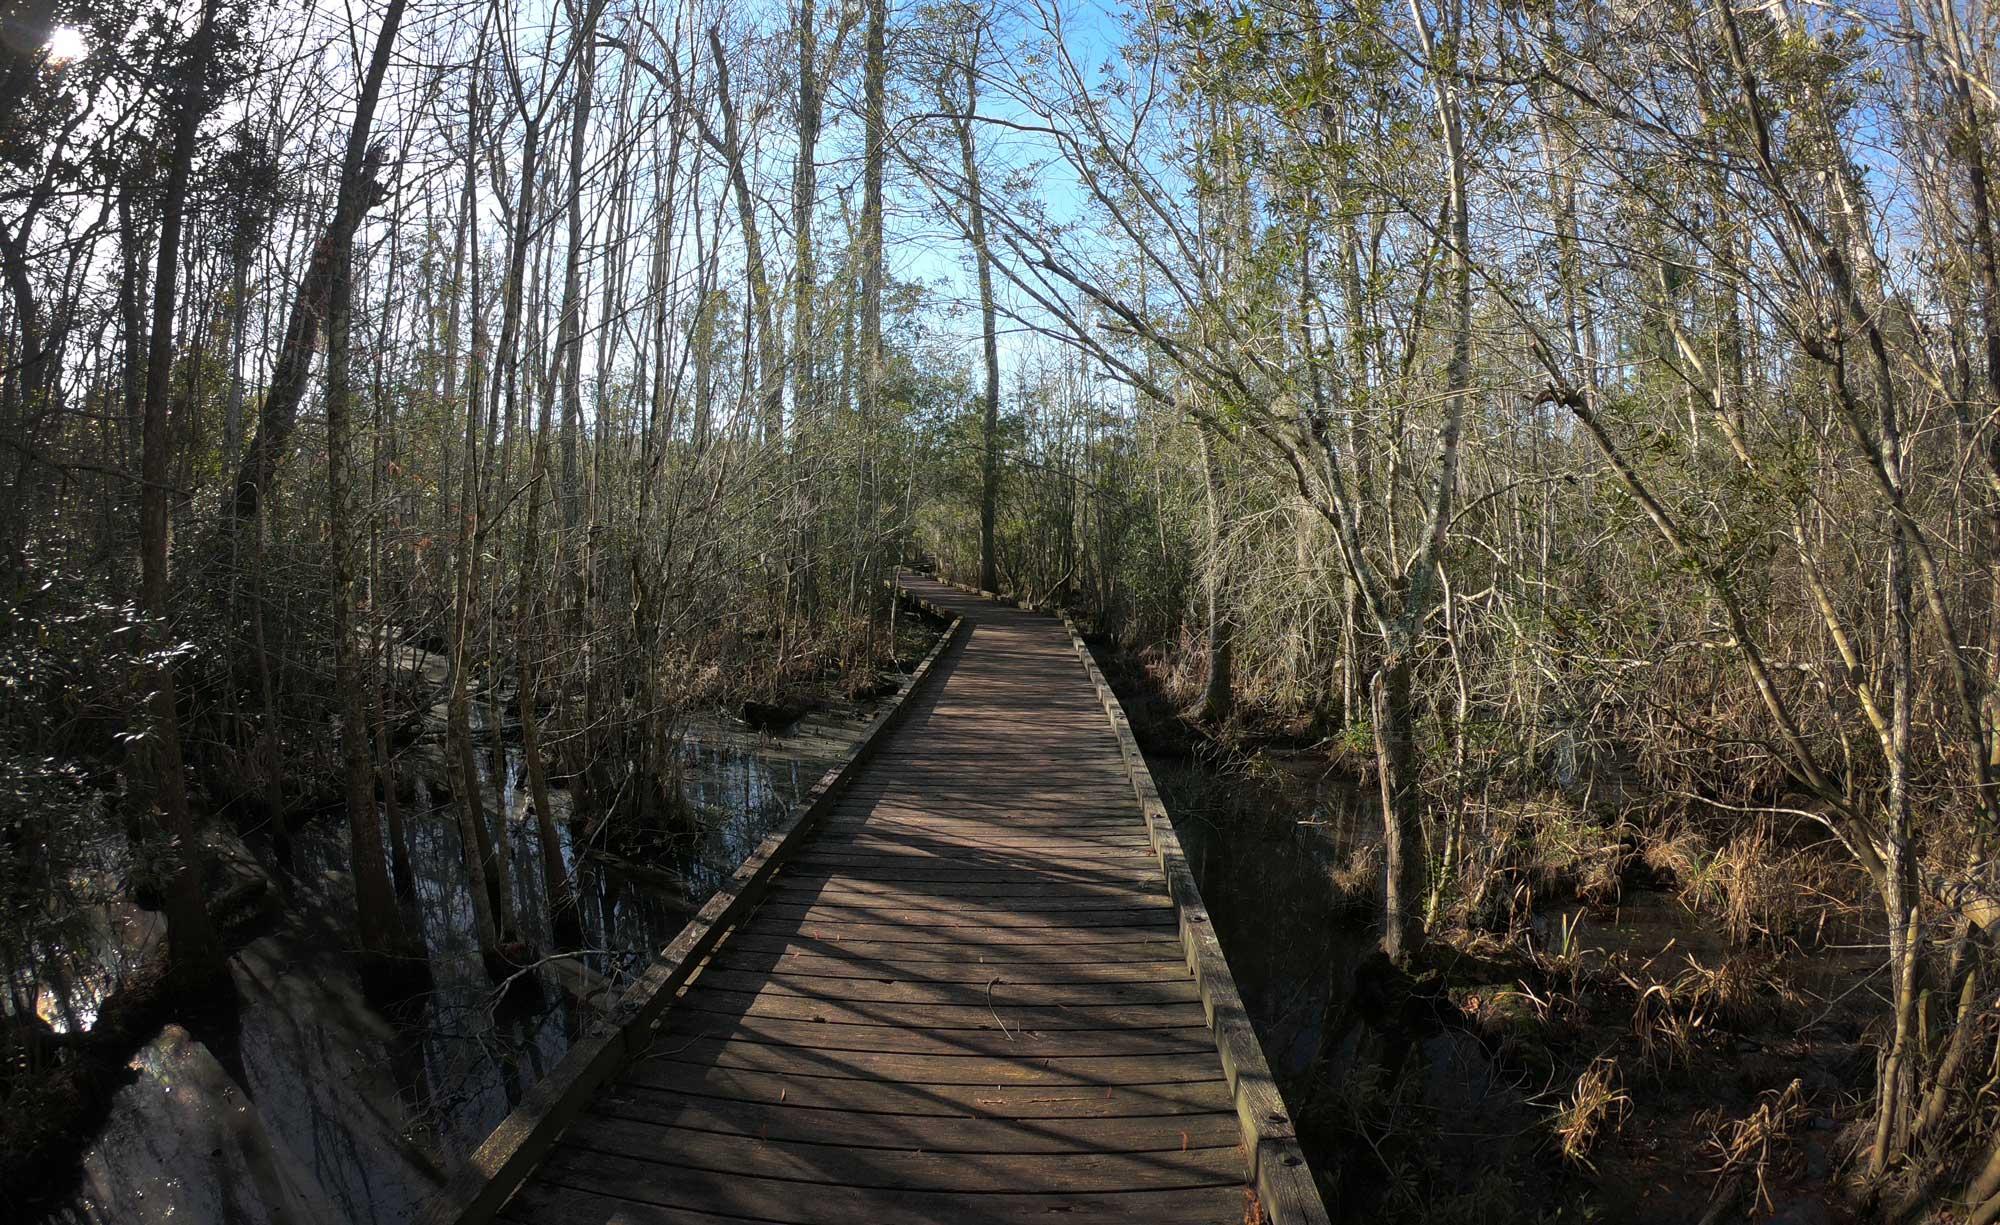 Goose Creek State Park Palmetto Boardwalk through wetlands in North Carolina